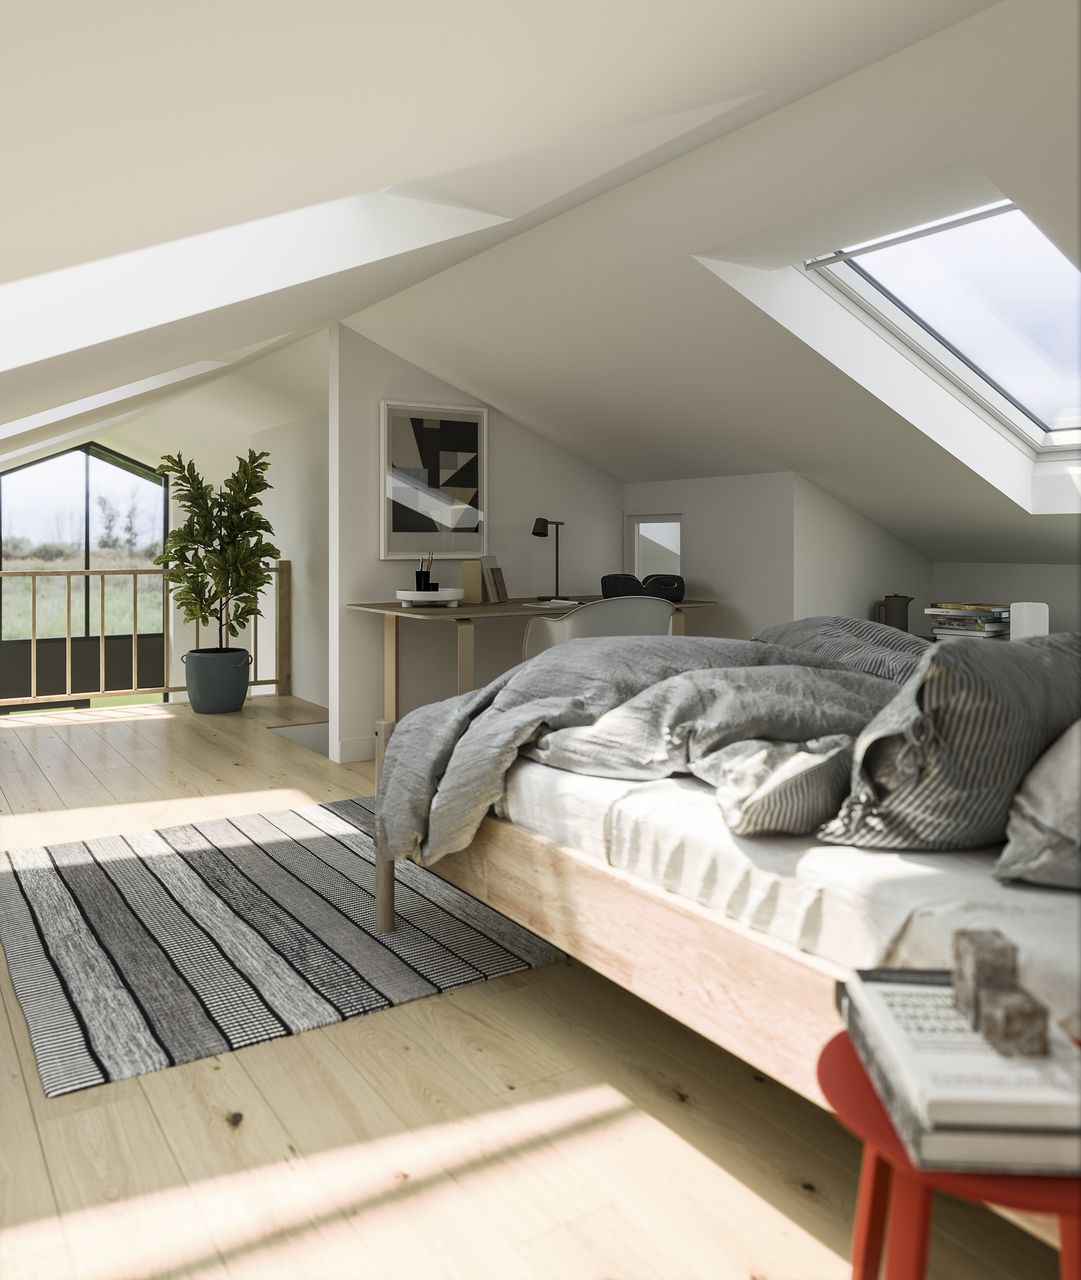 Da Luce Alla Soffitta luce e aria fresca per una casa più sana